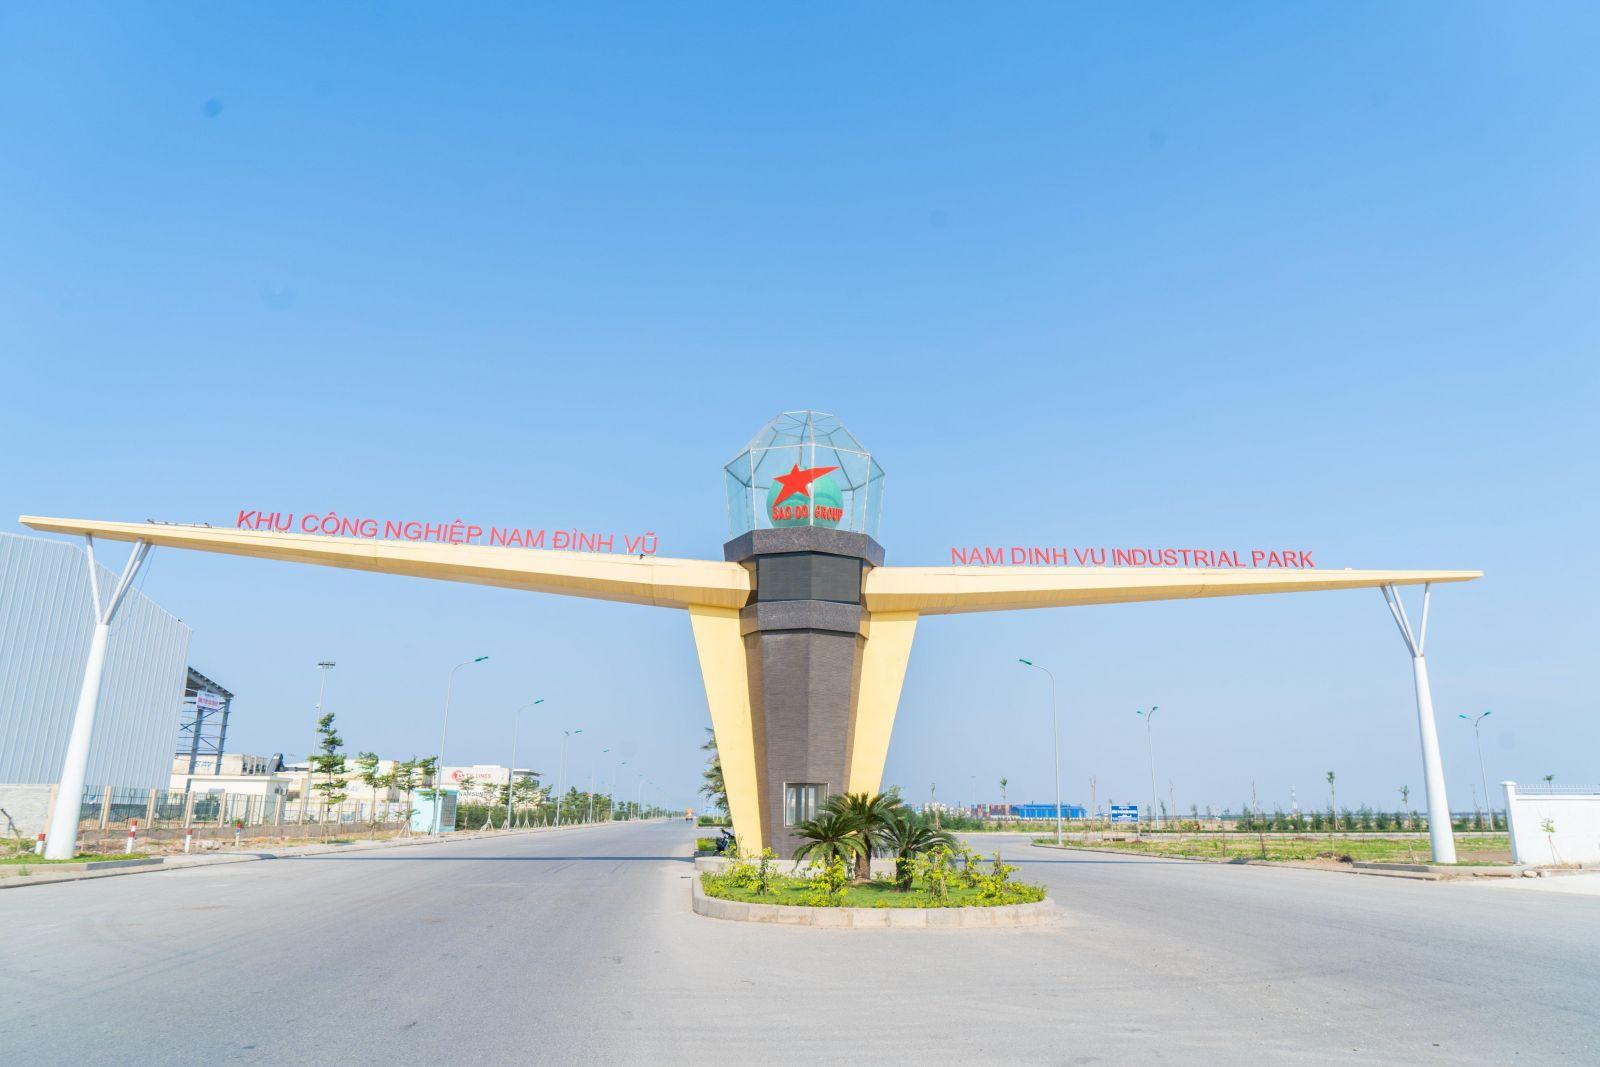 Nam Dinh Vu Industrial Park – Hai Phong Province